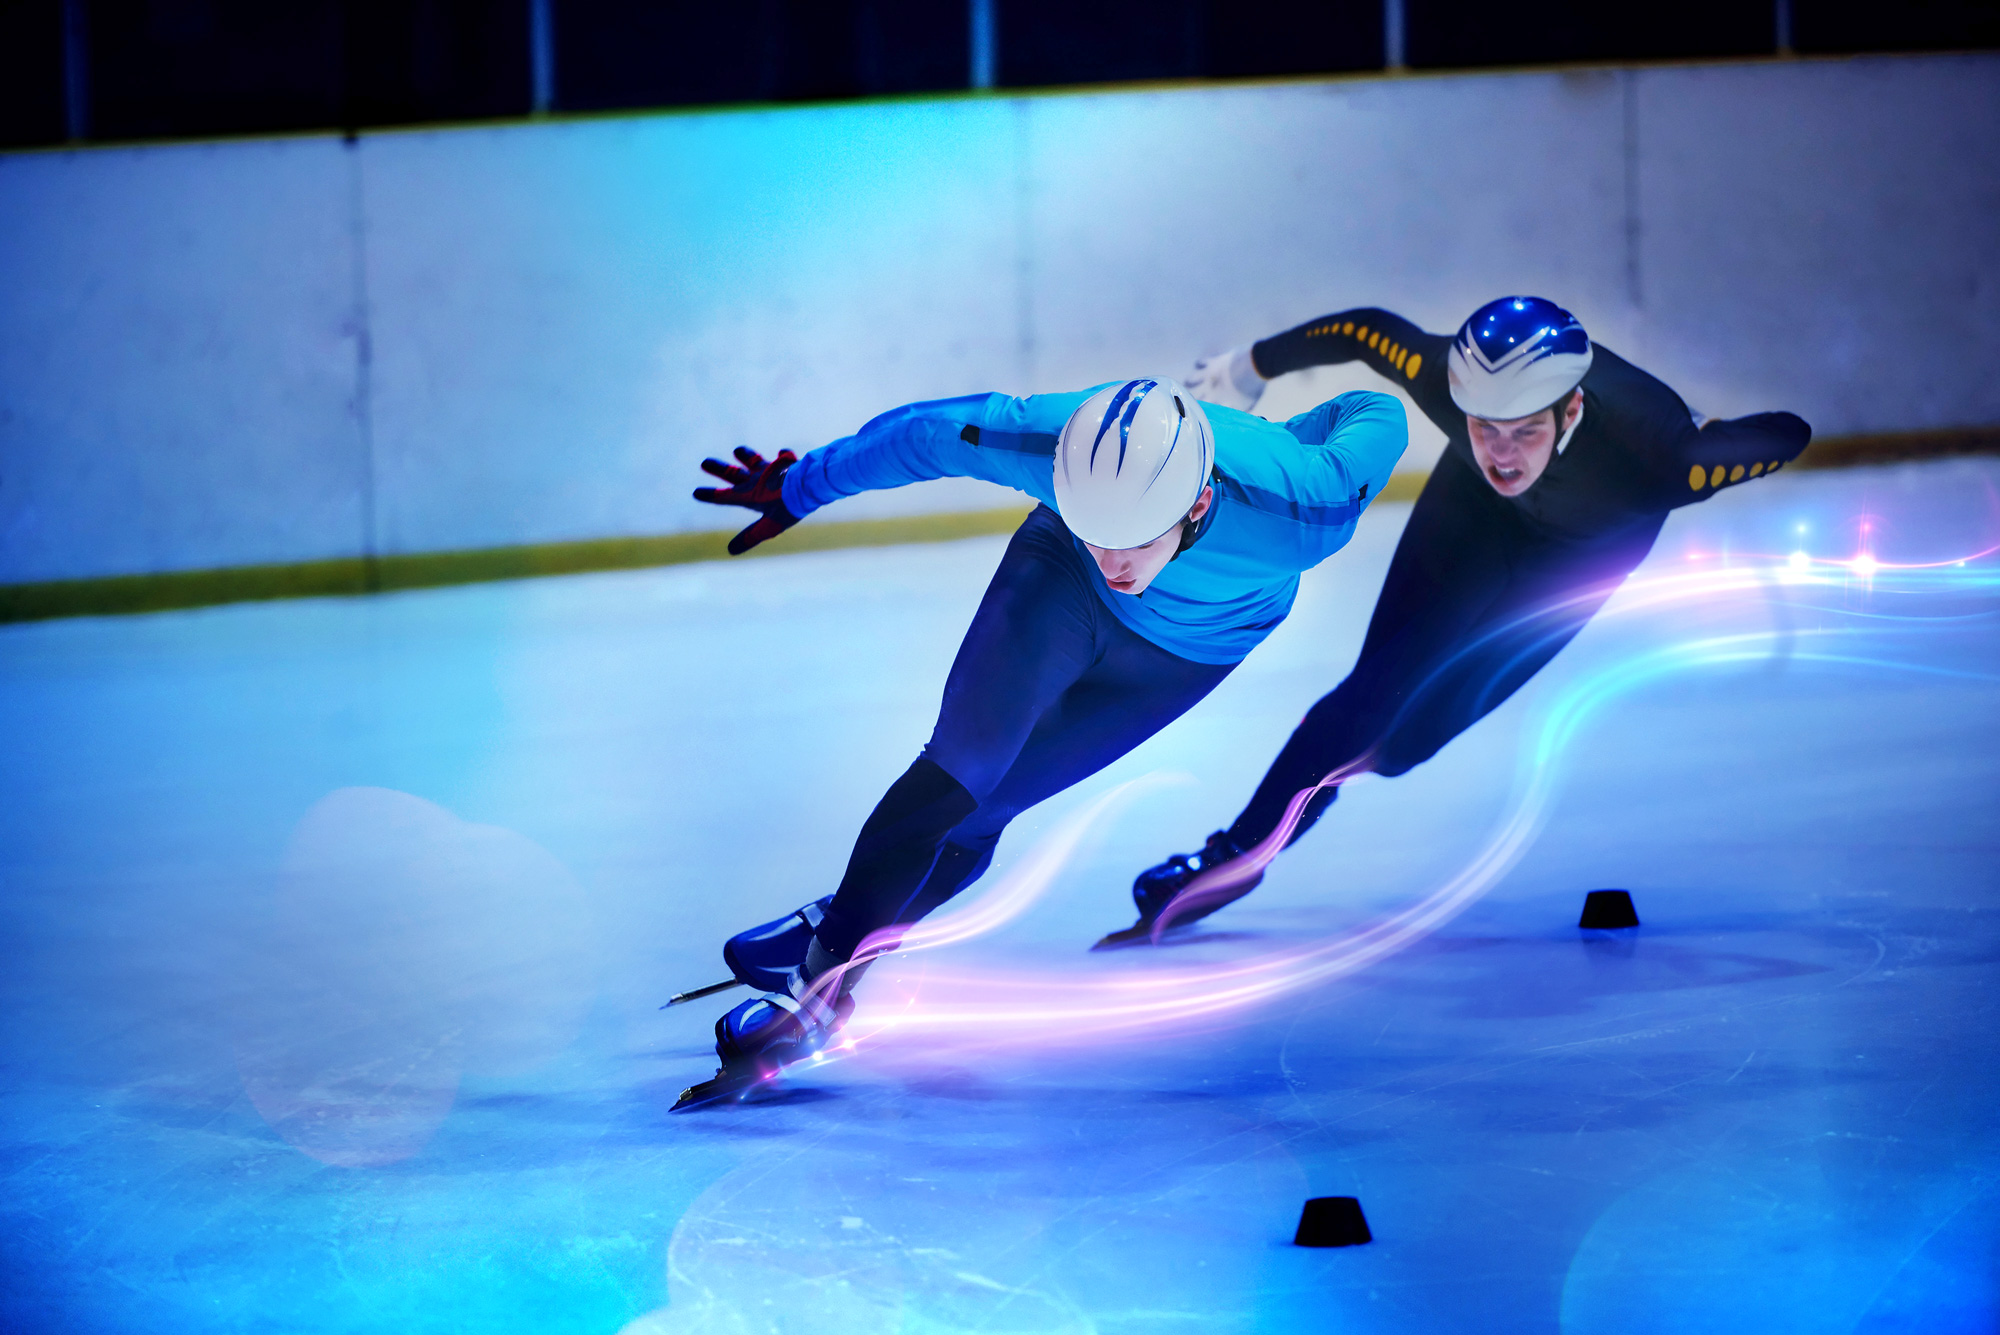 Skating Center point-of-sale management solution